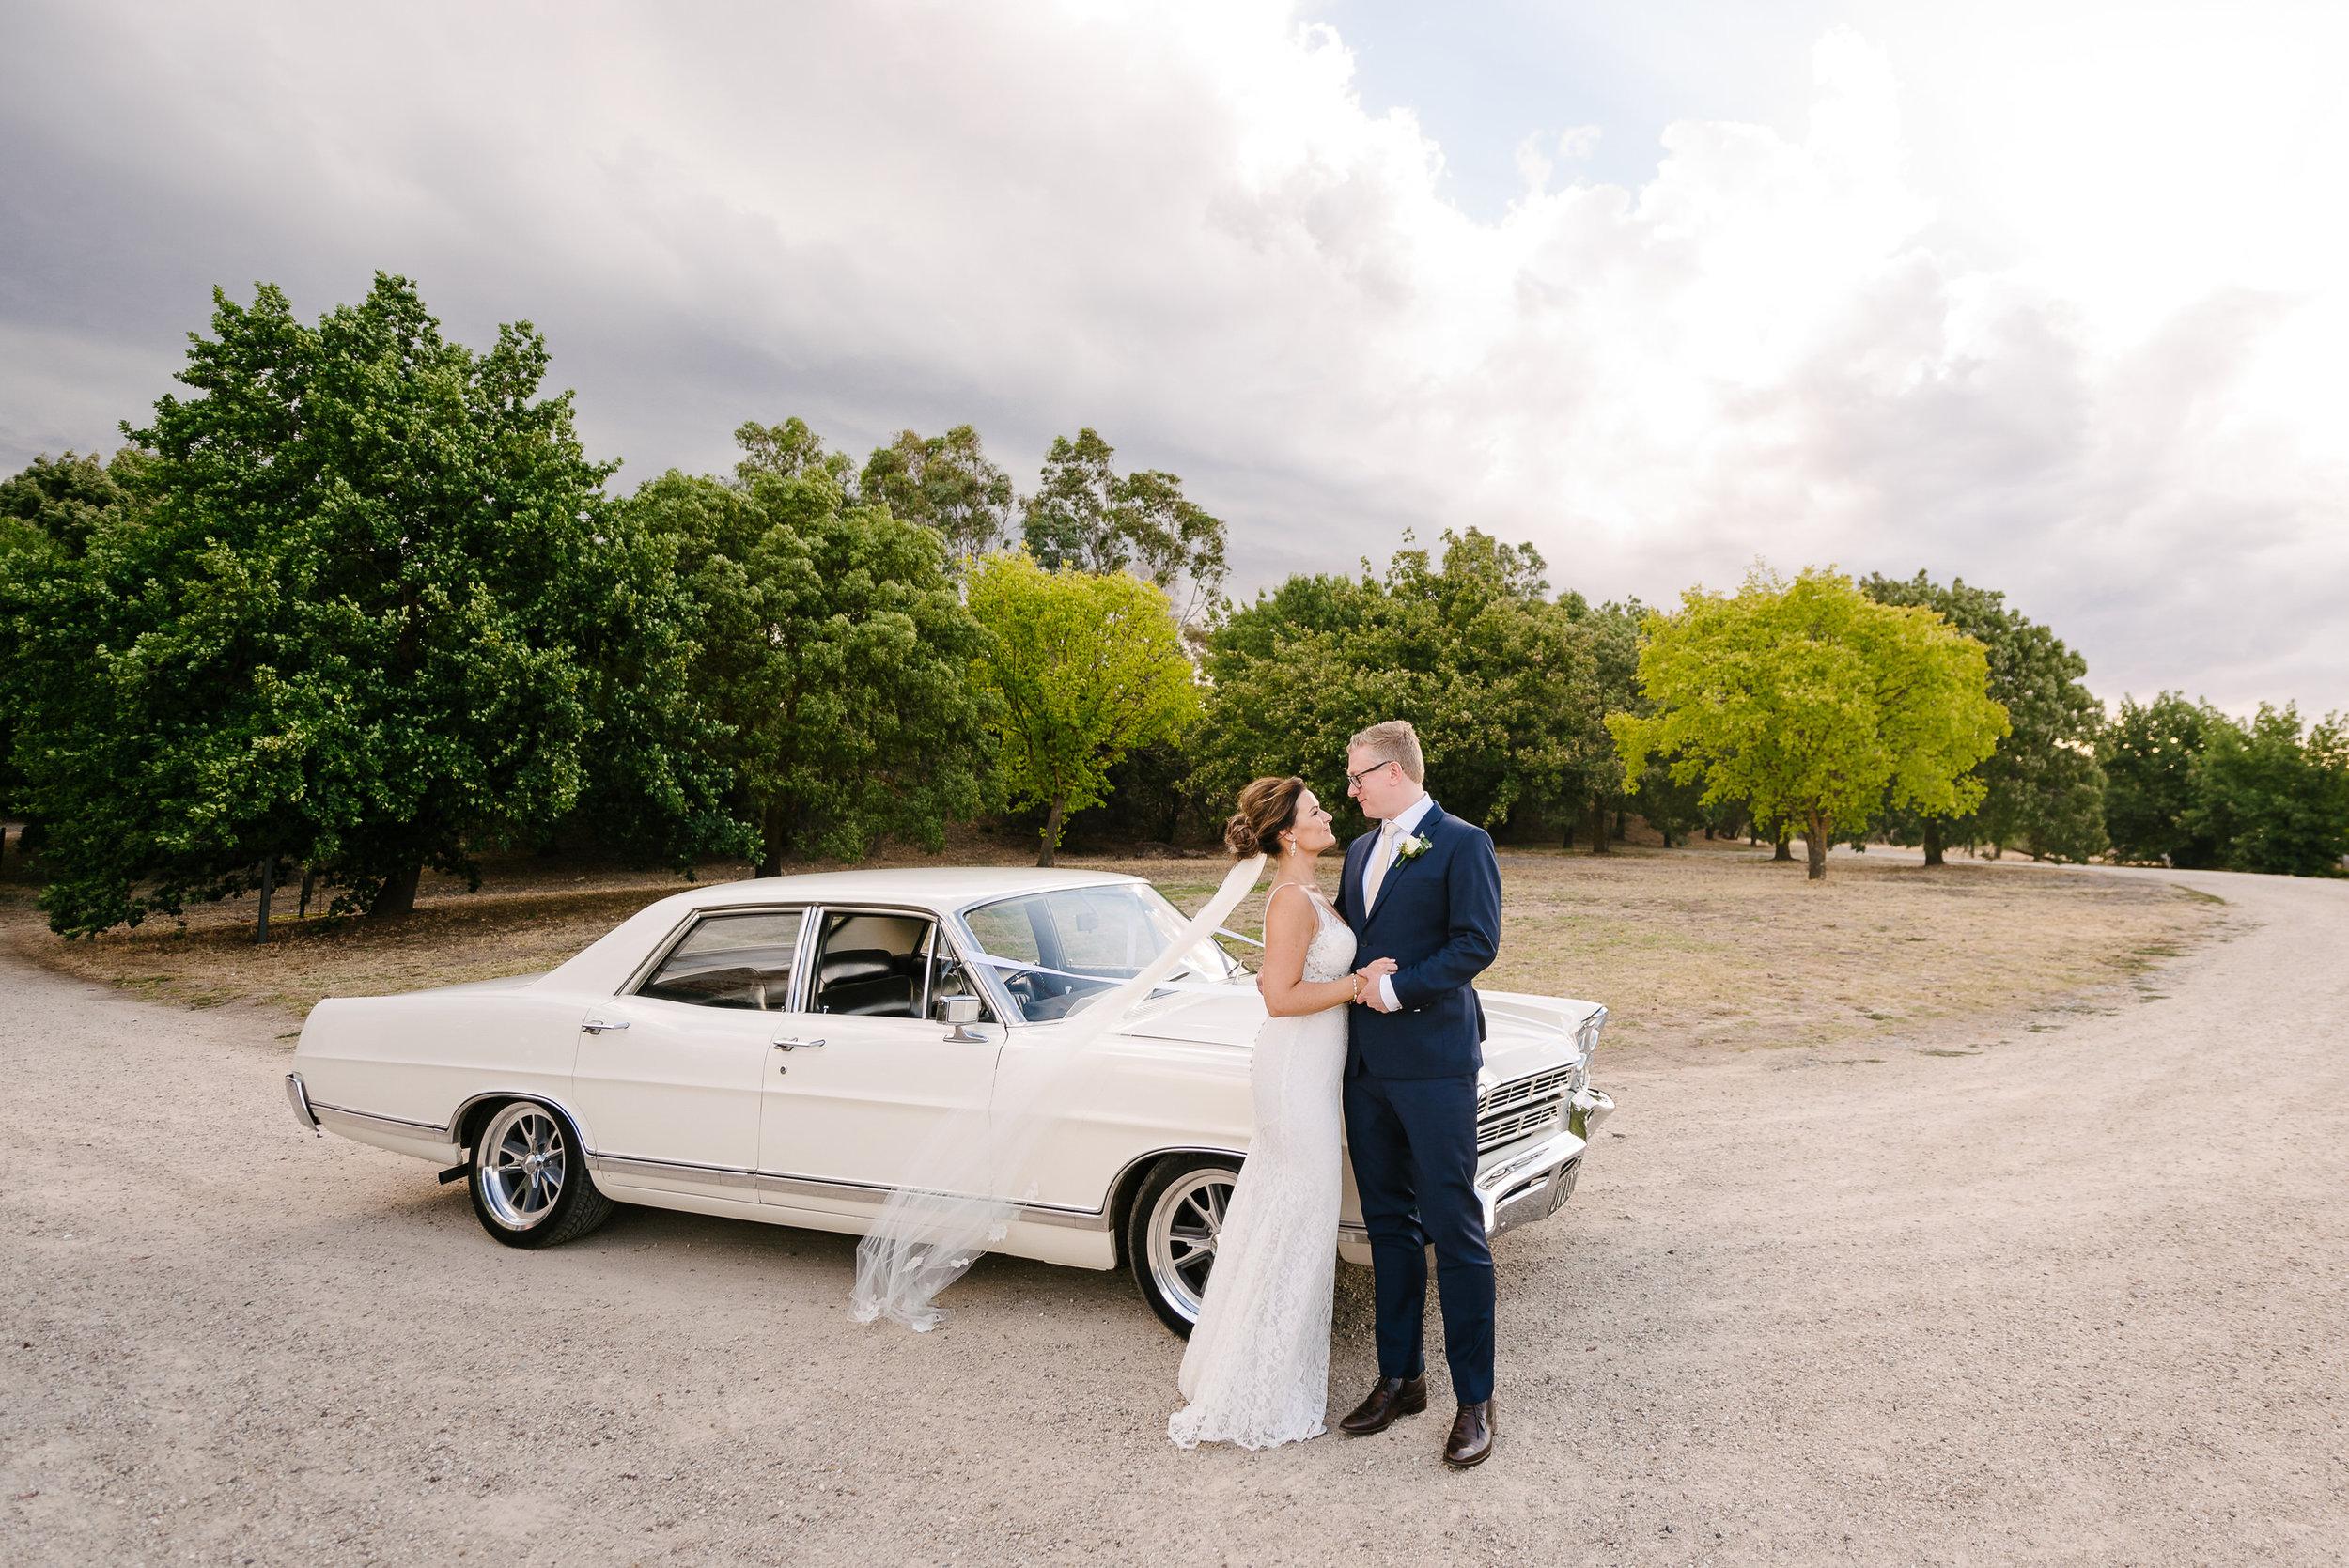 Justin_And_Jim_Photography_Chateau_Dore_Bendigo_Wedding75.JPG